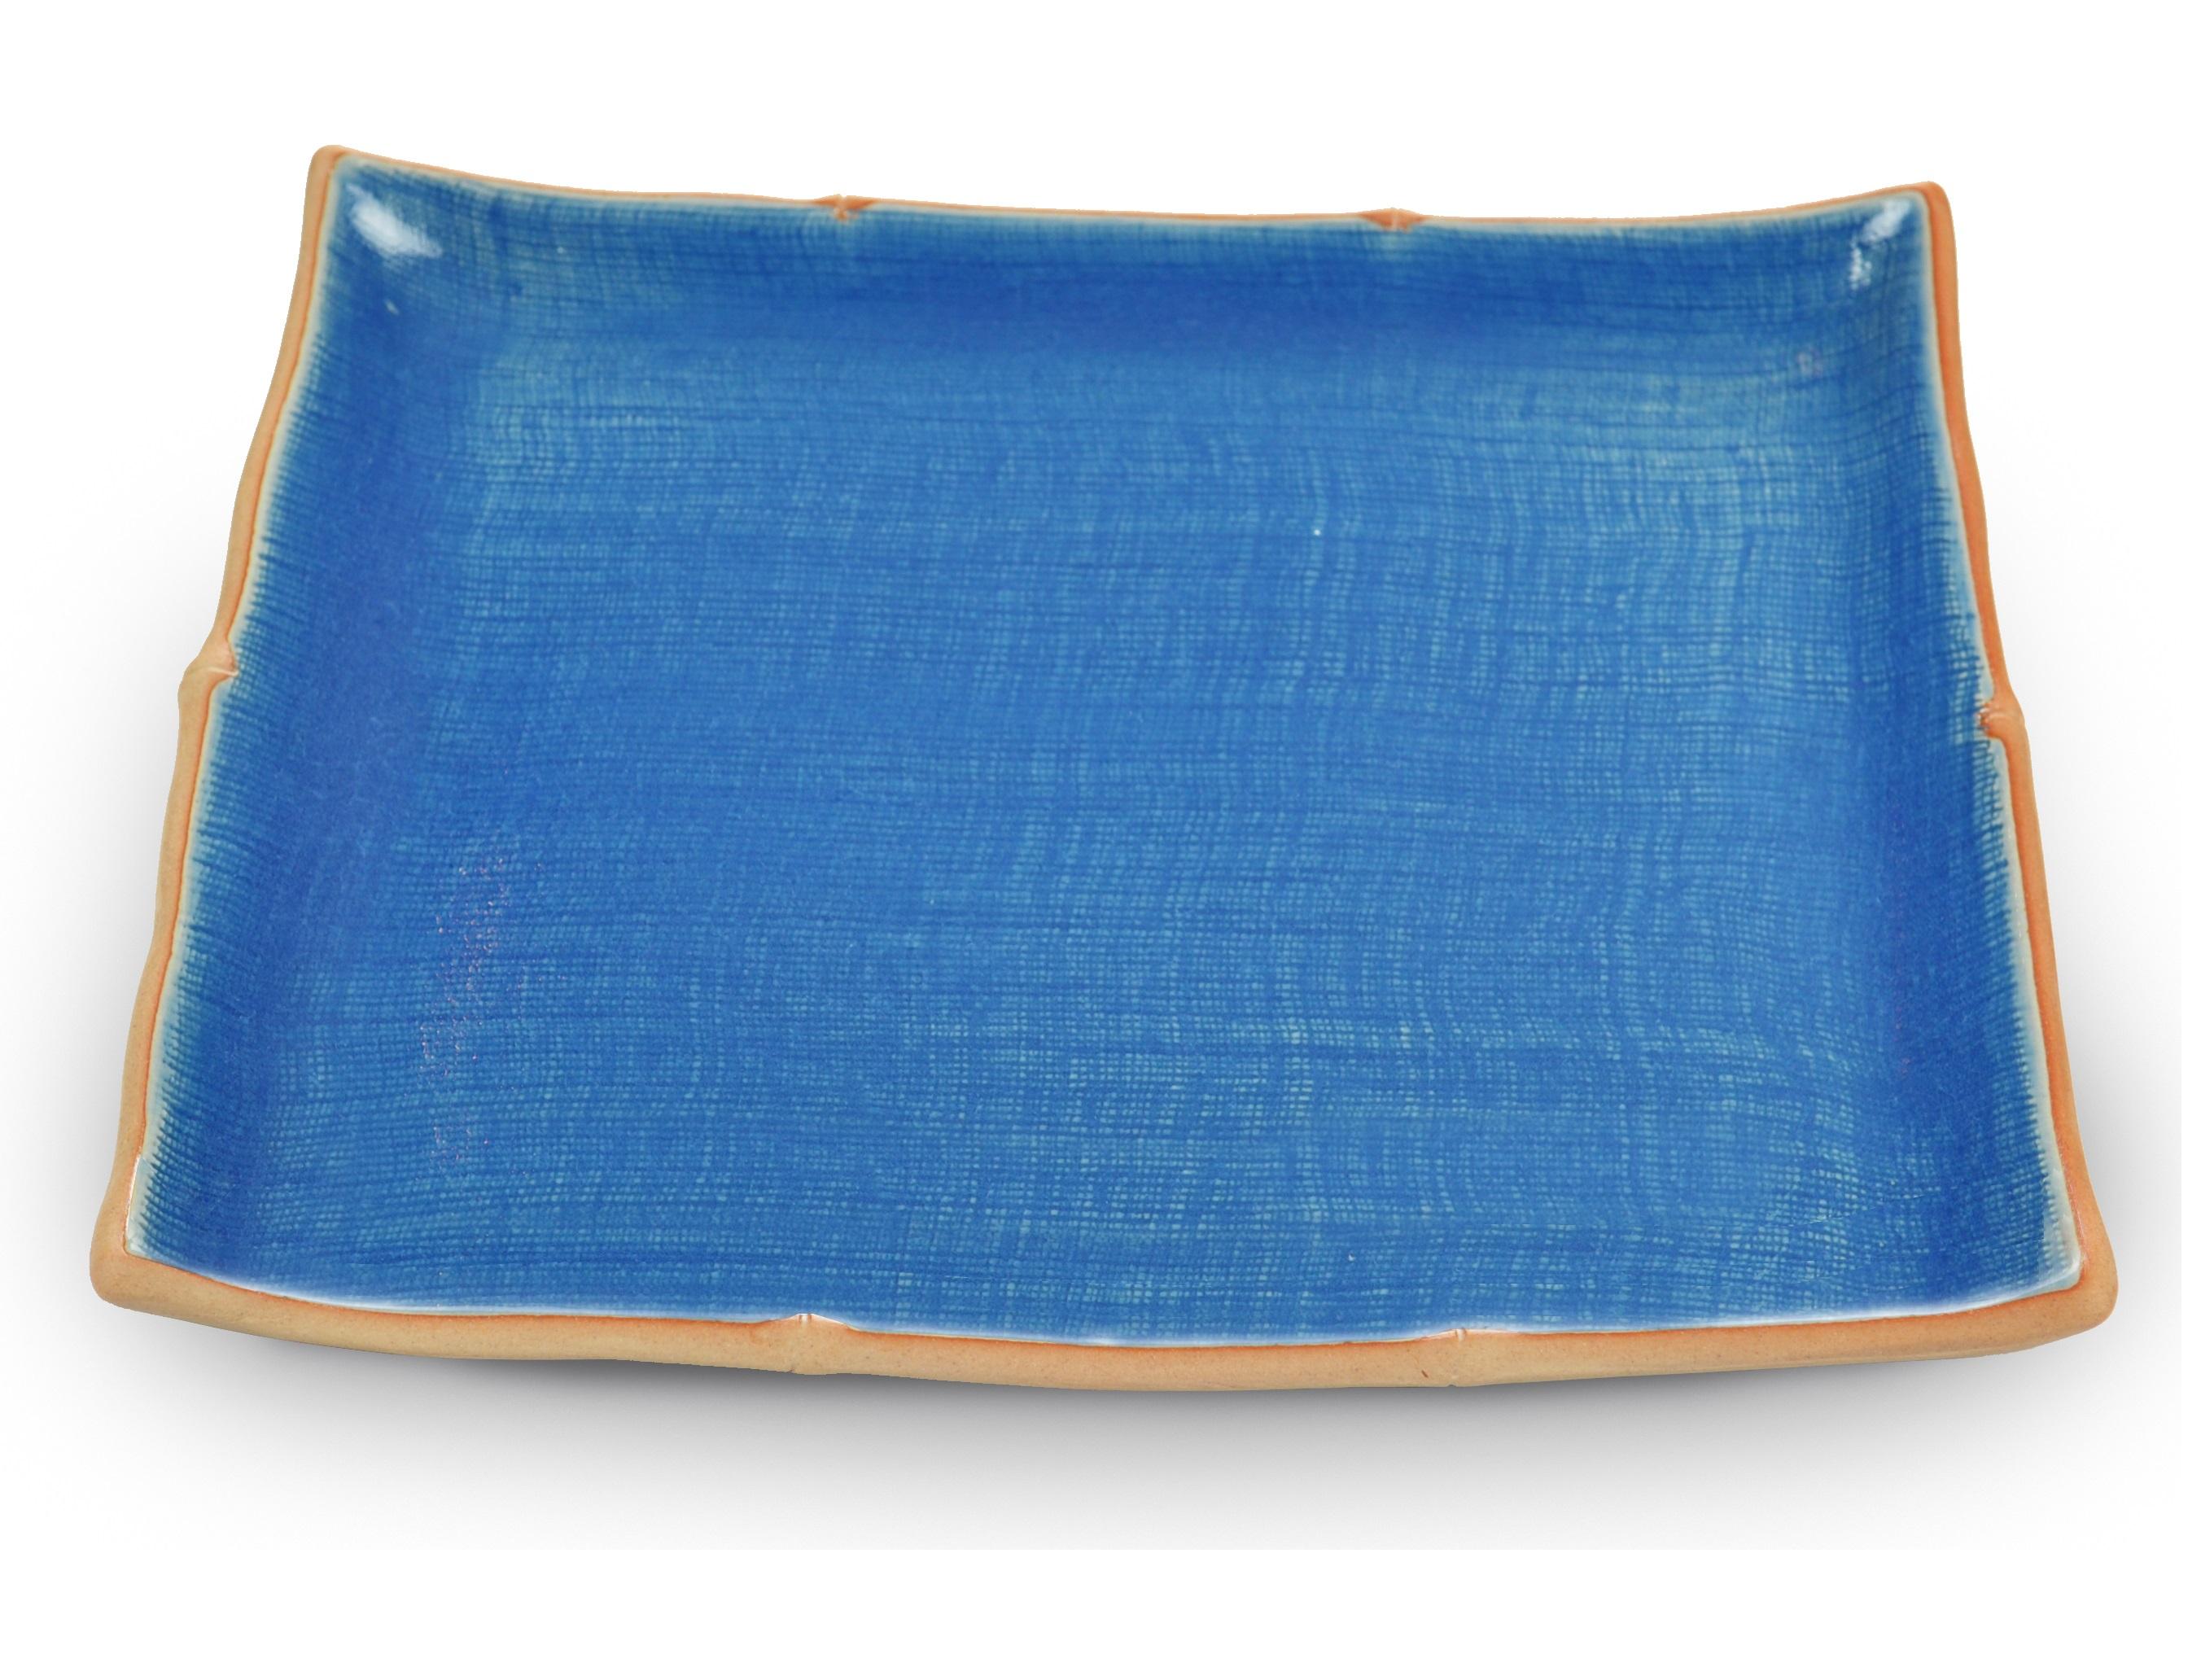 Блюдо Bamboo LineДекоративные блюда<br><br><br>Material: Керамика<br>Length см: 27<br>Width см: 22.5<br>Height см: 3